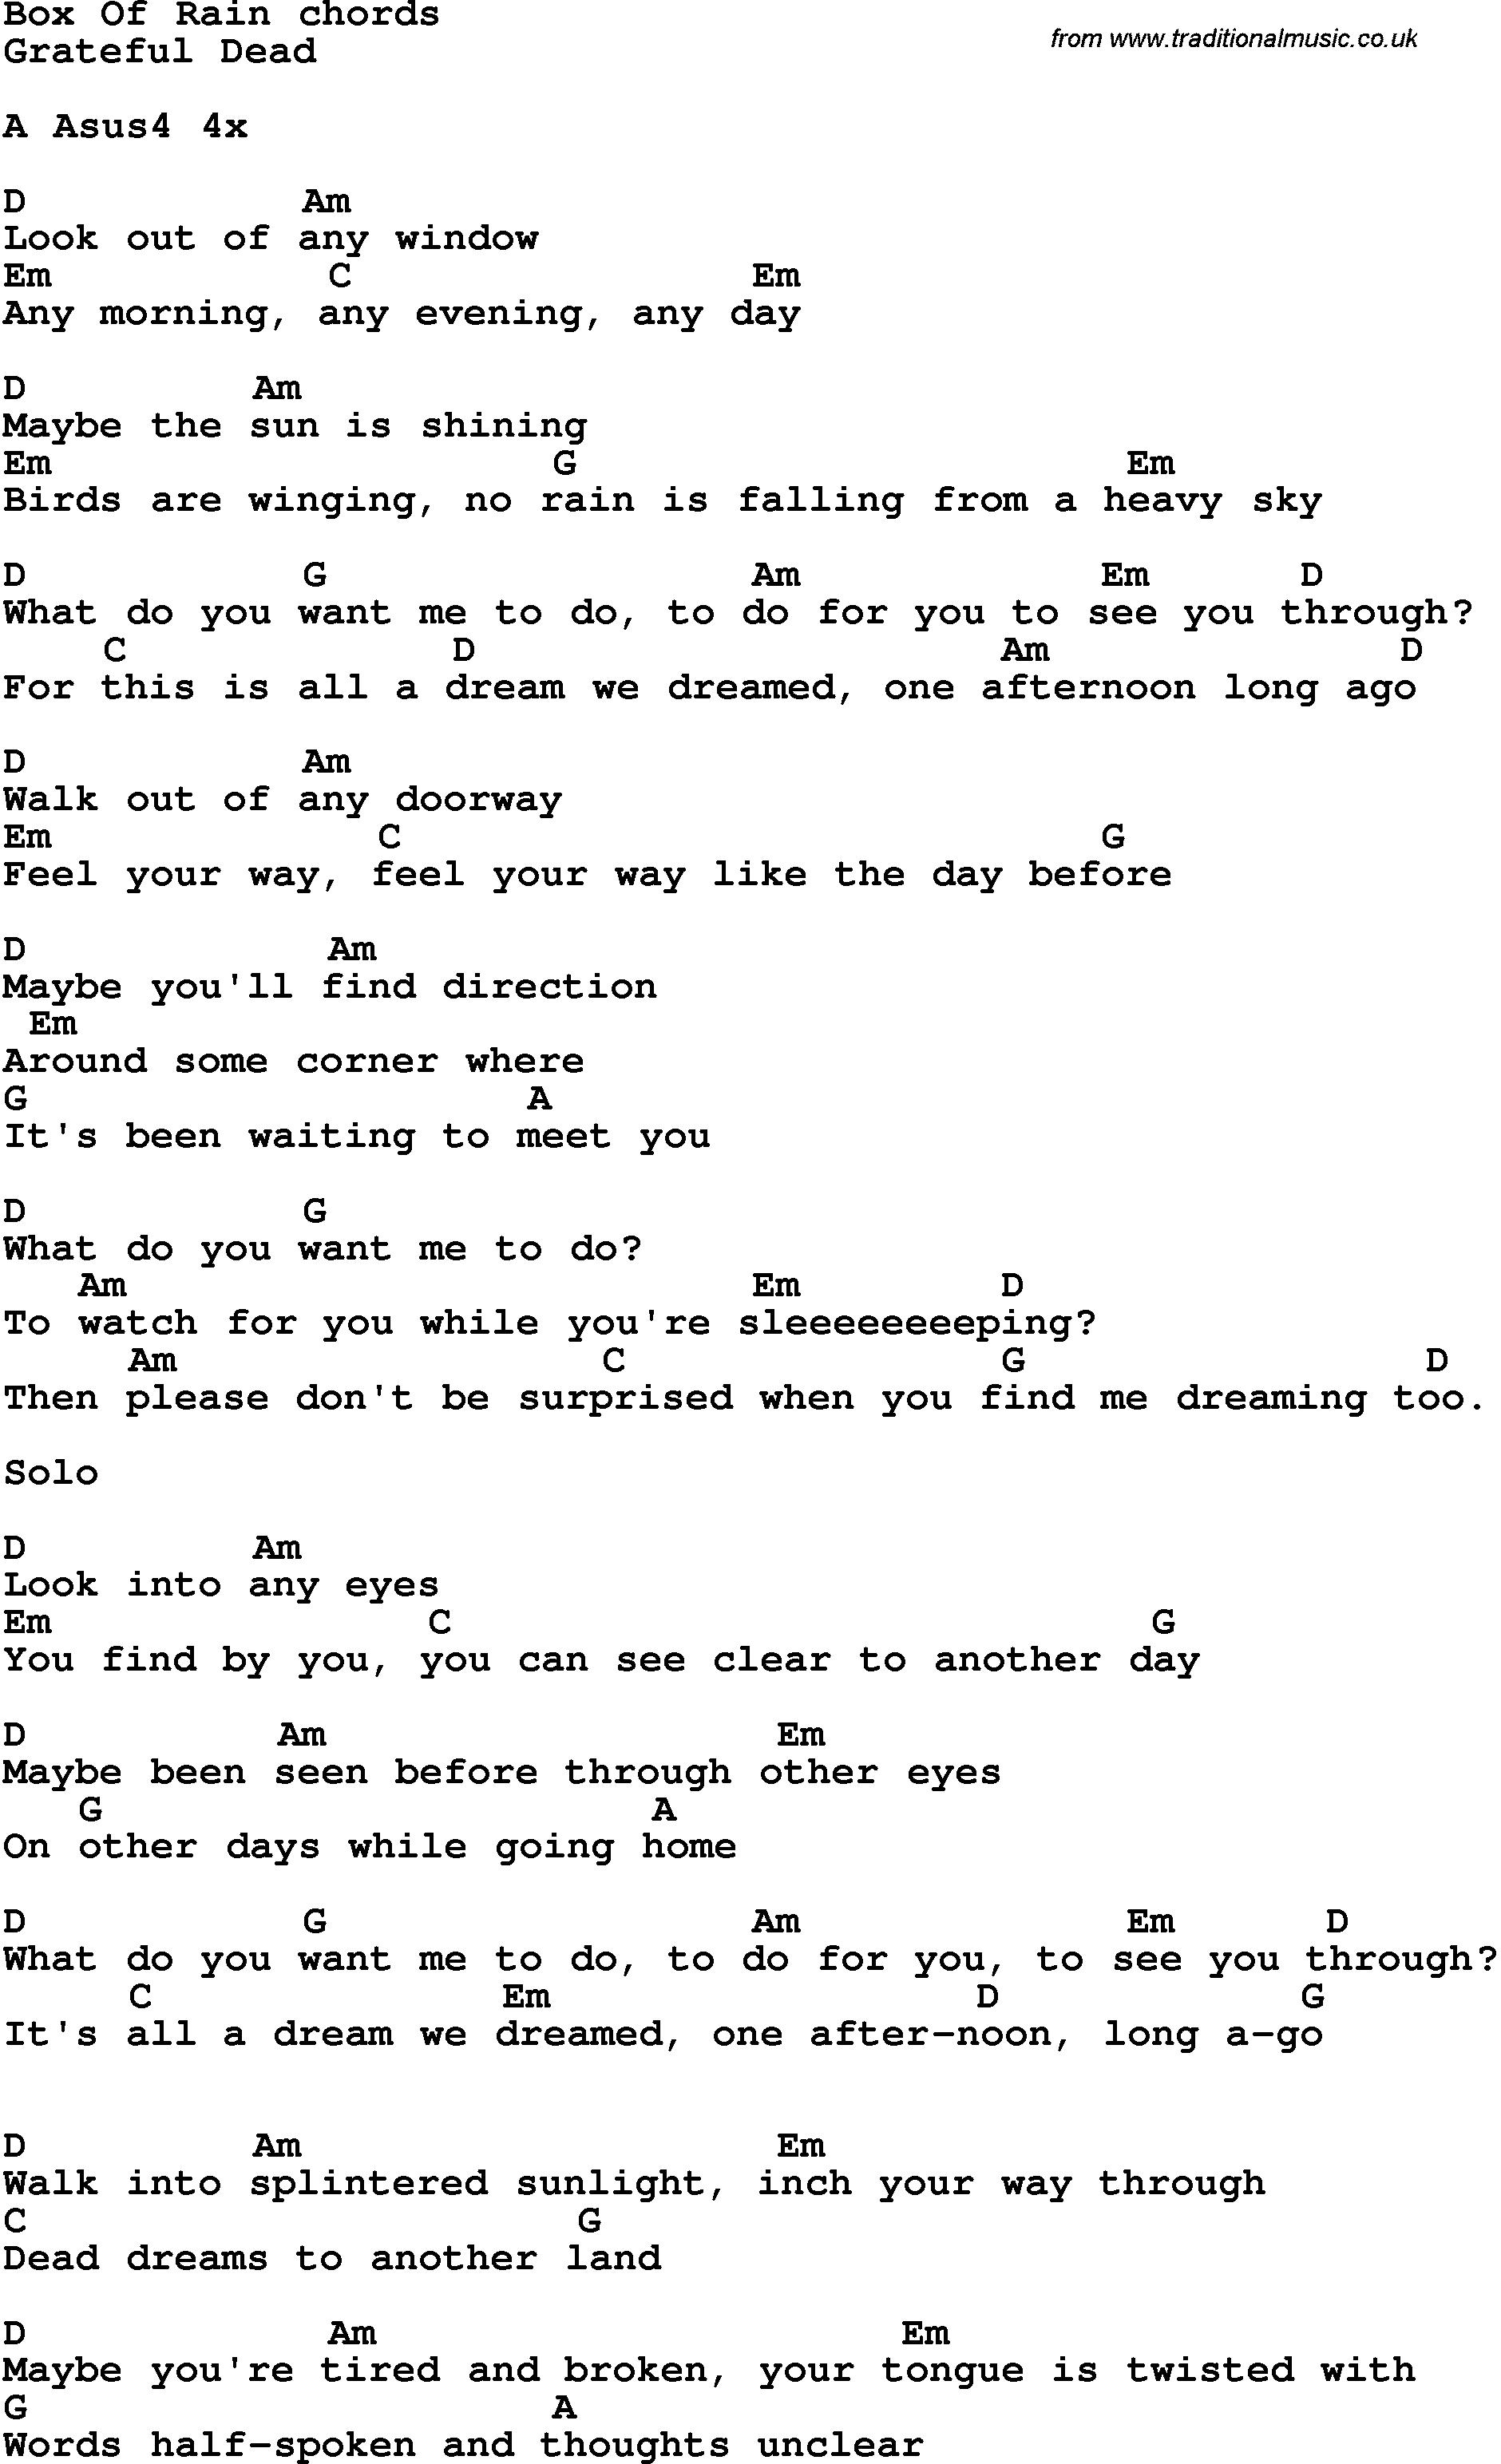 Song lyrics with guitar chords for box of rain yas pinterest song lyrics with guitar chords for box of rain hexwebz Gallery